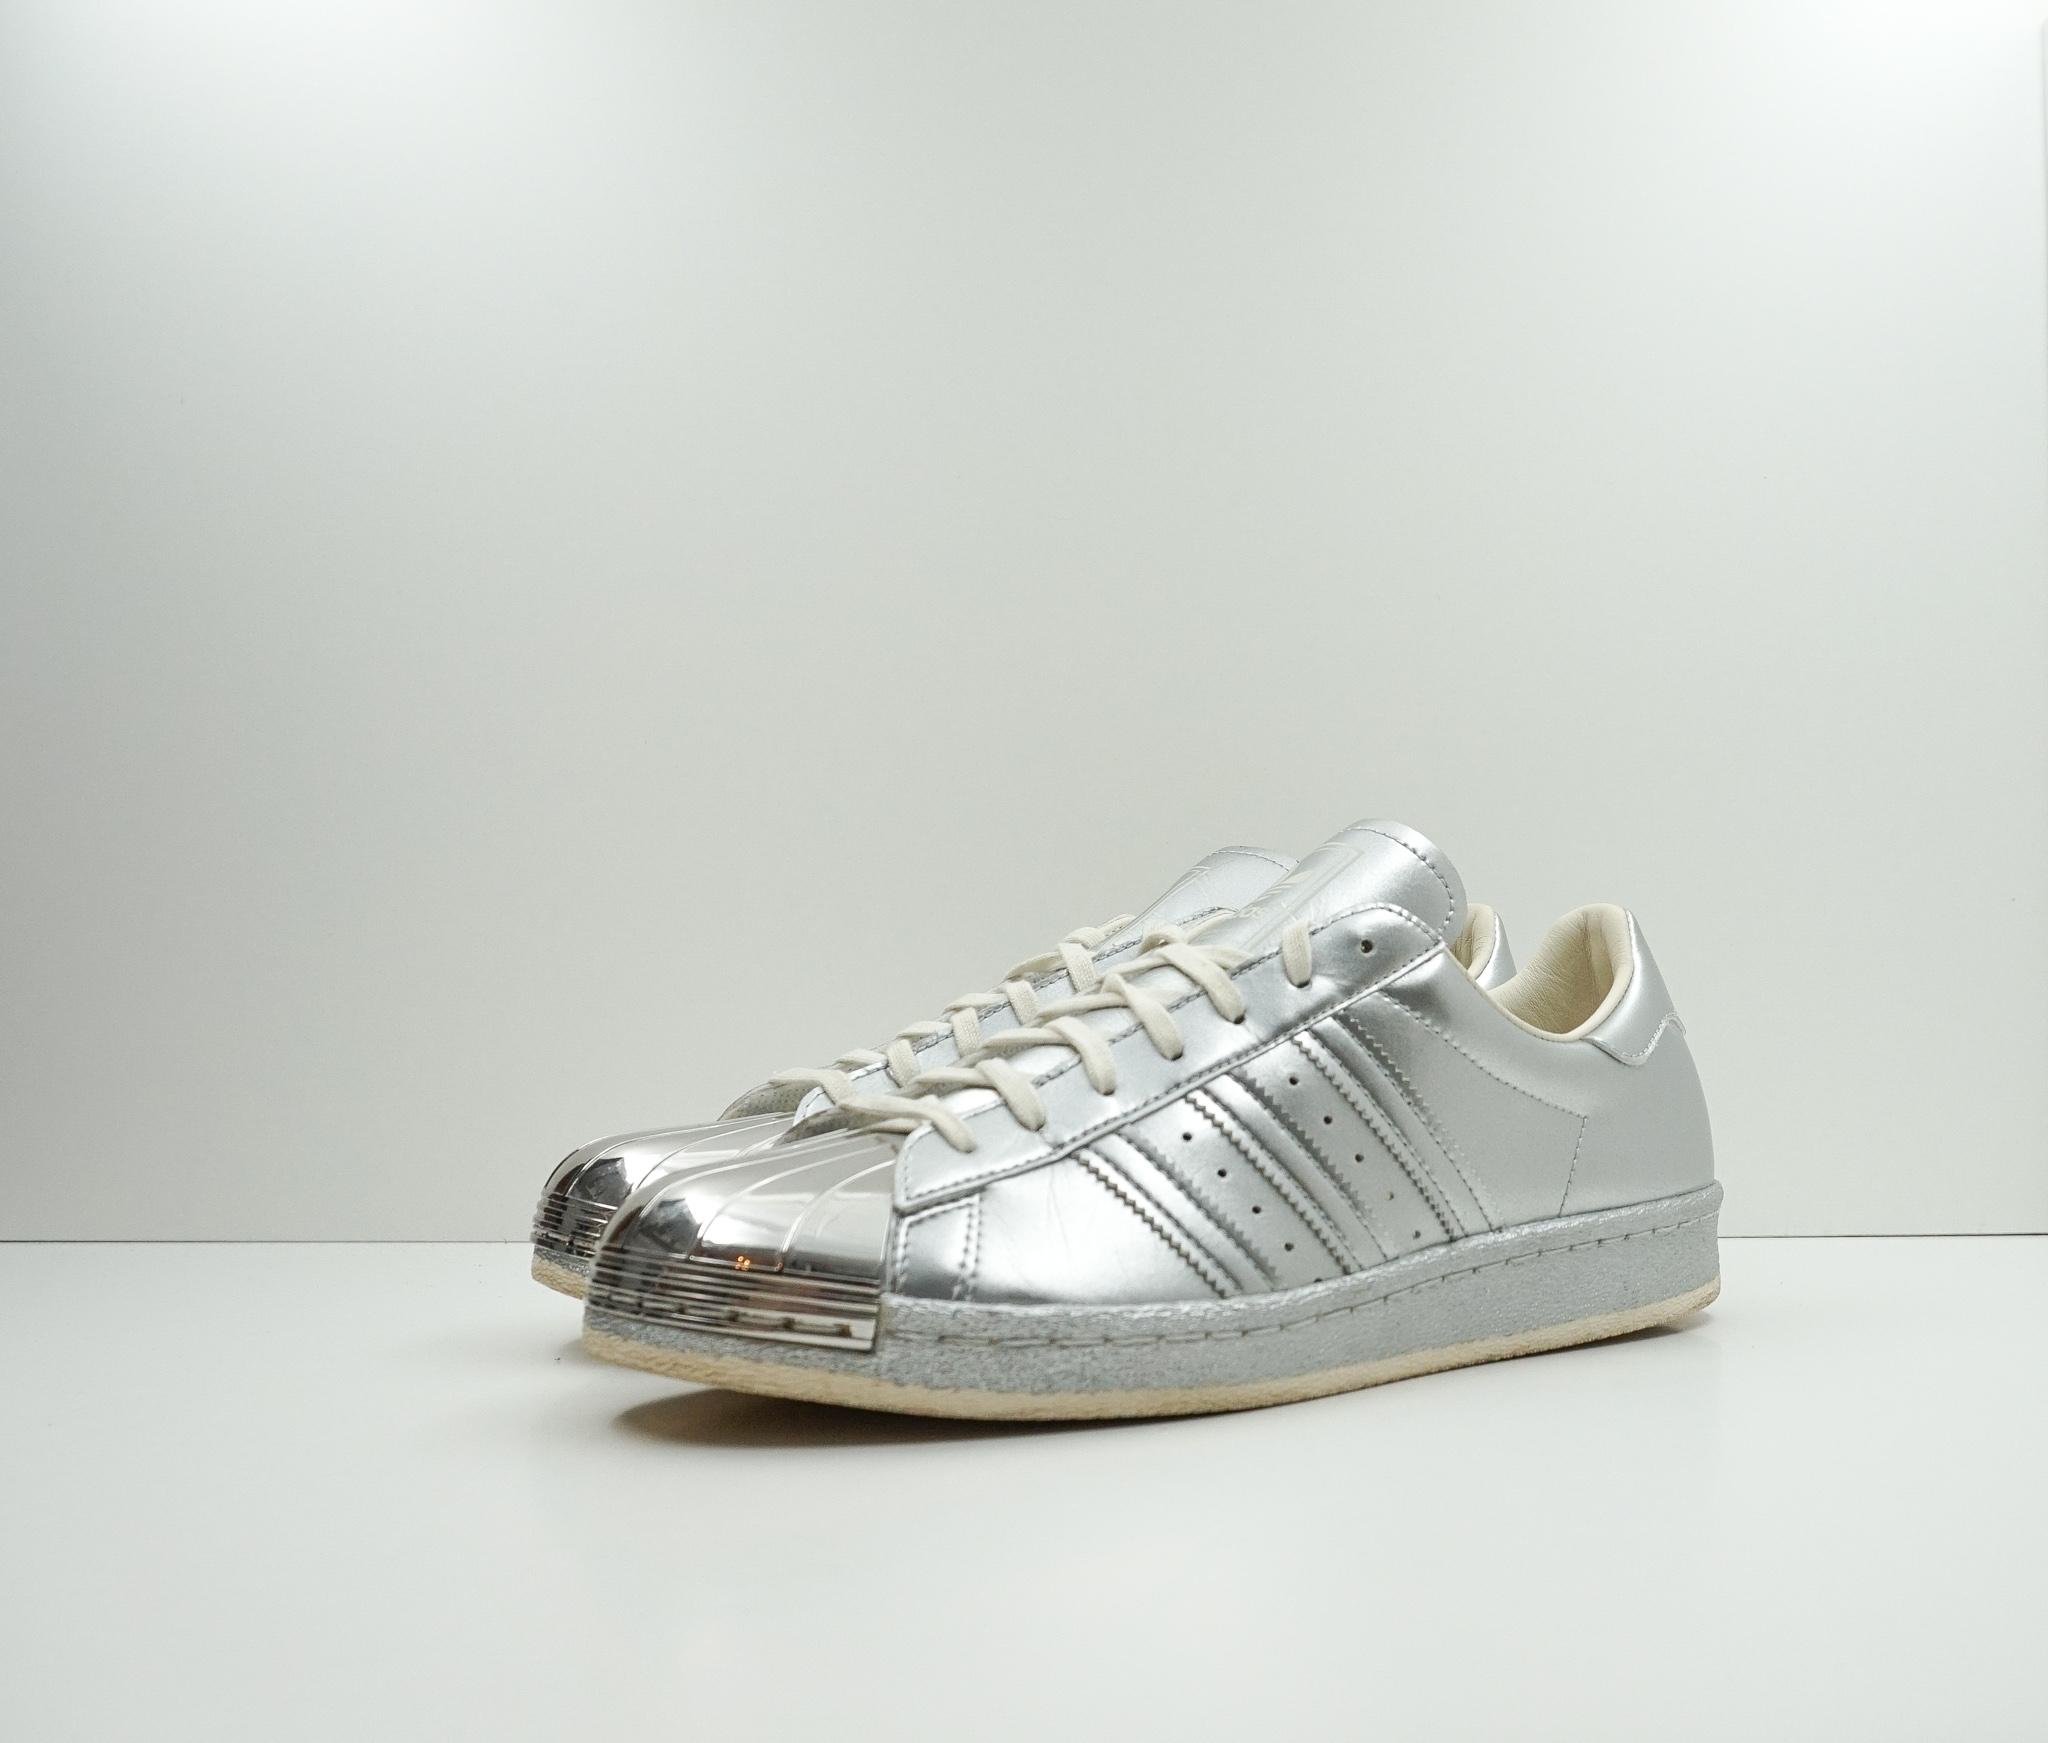 Adidas Superstar 80s Metallic Pack